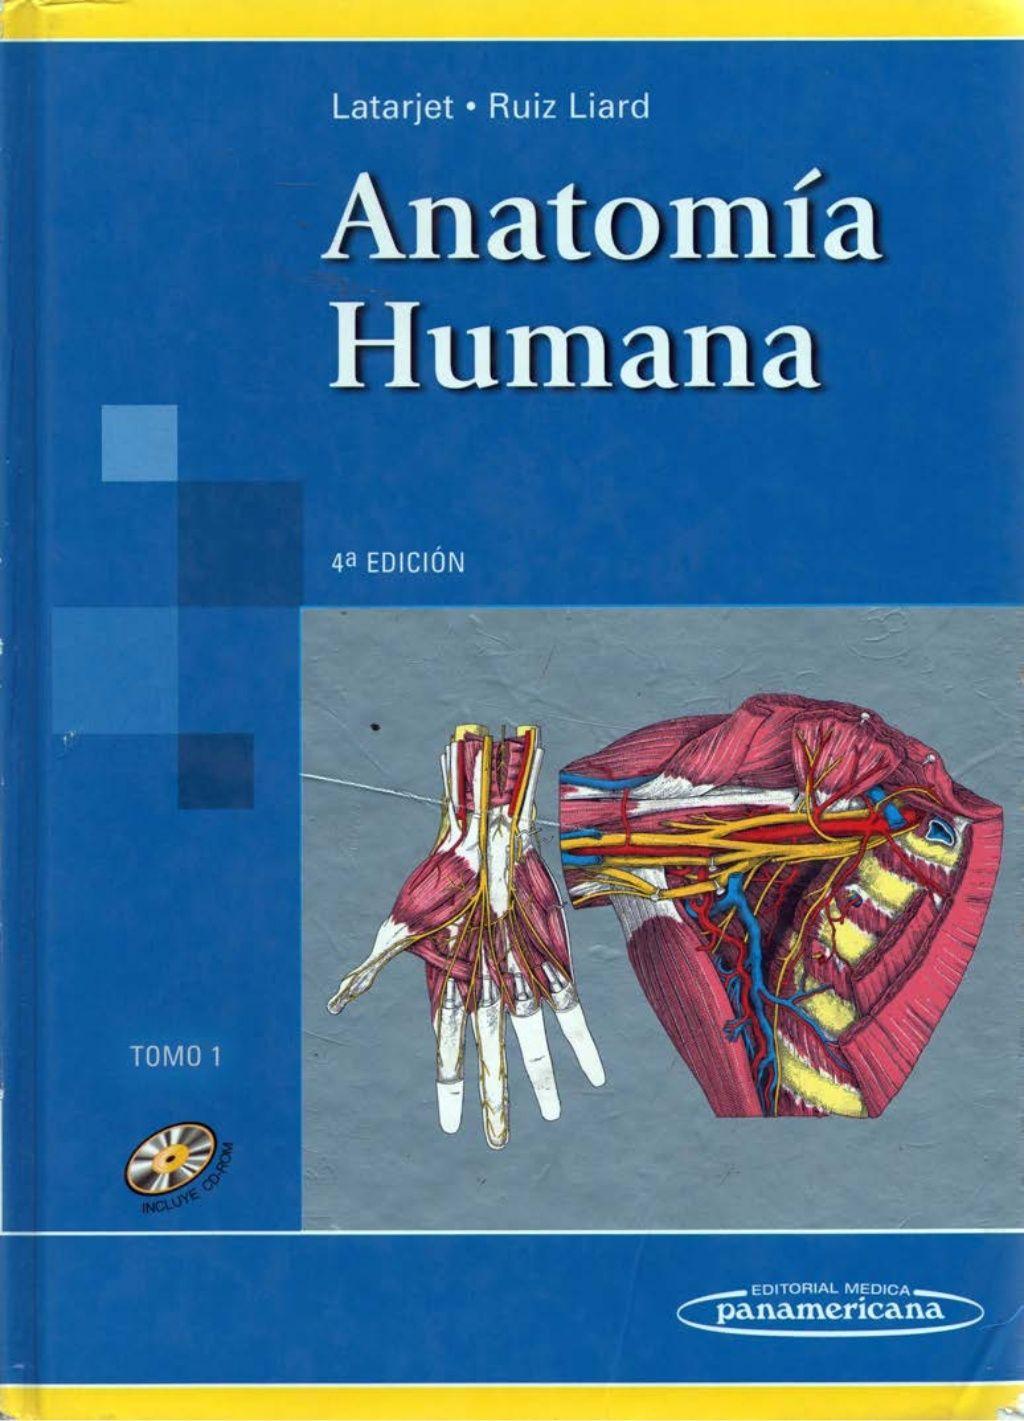 ANATOMIA HUMANA LATARJET TOMO I (franja morada odontologia unlp) by ...